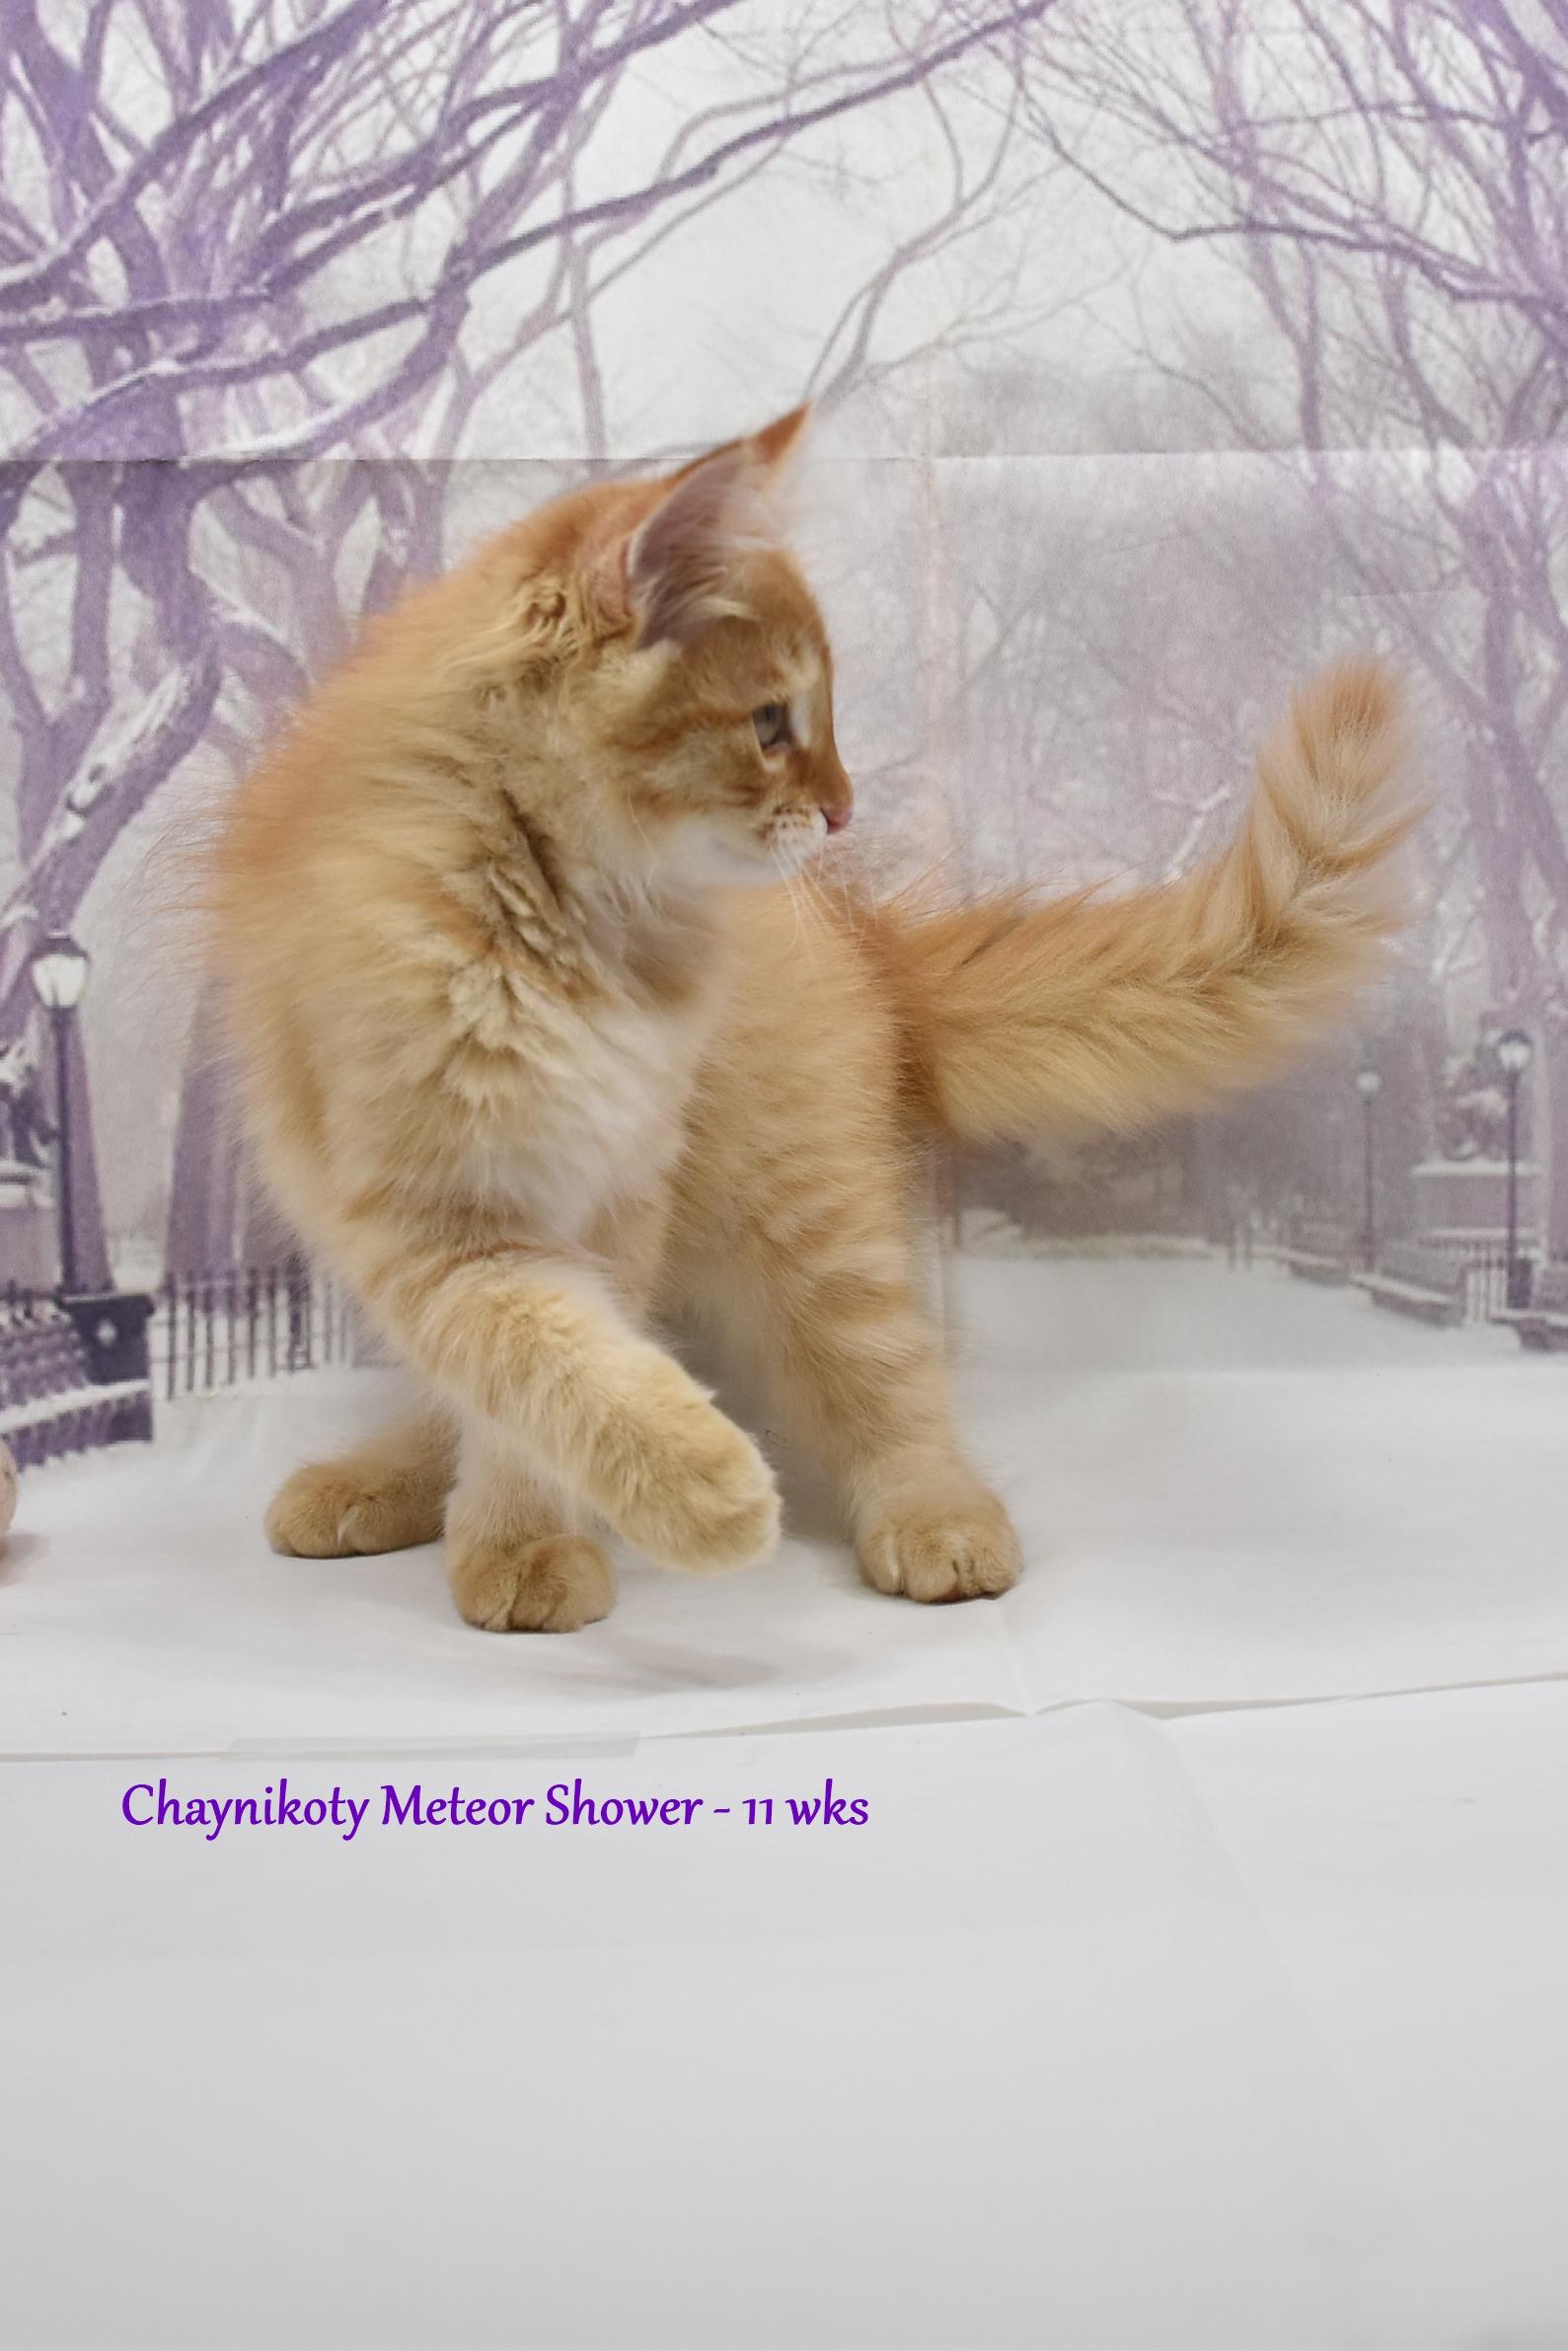 Chaynikoty Meteor Shower